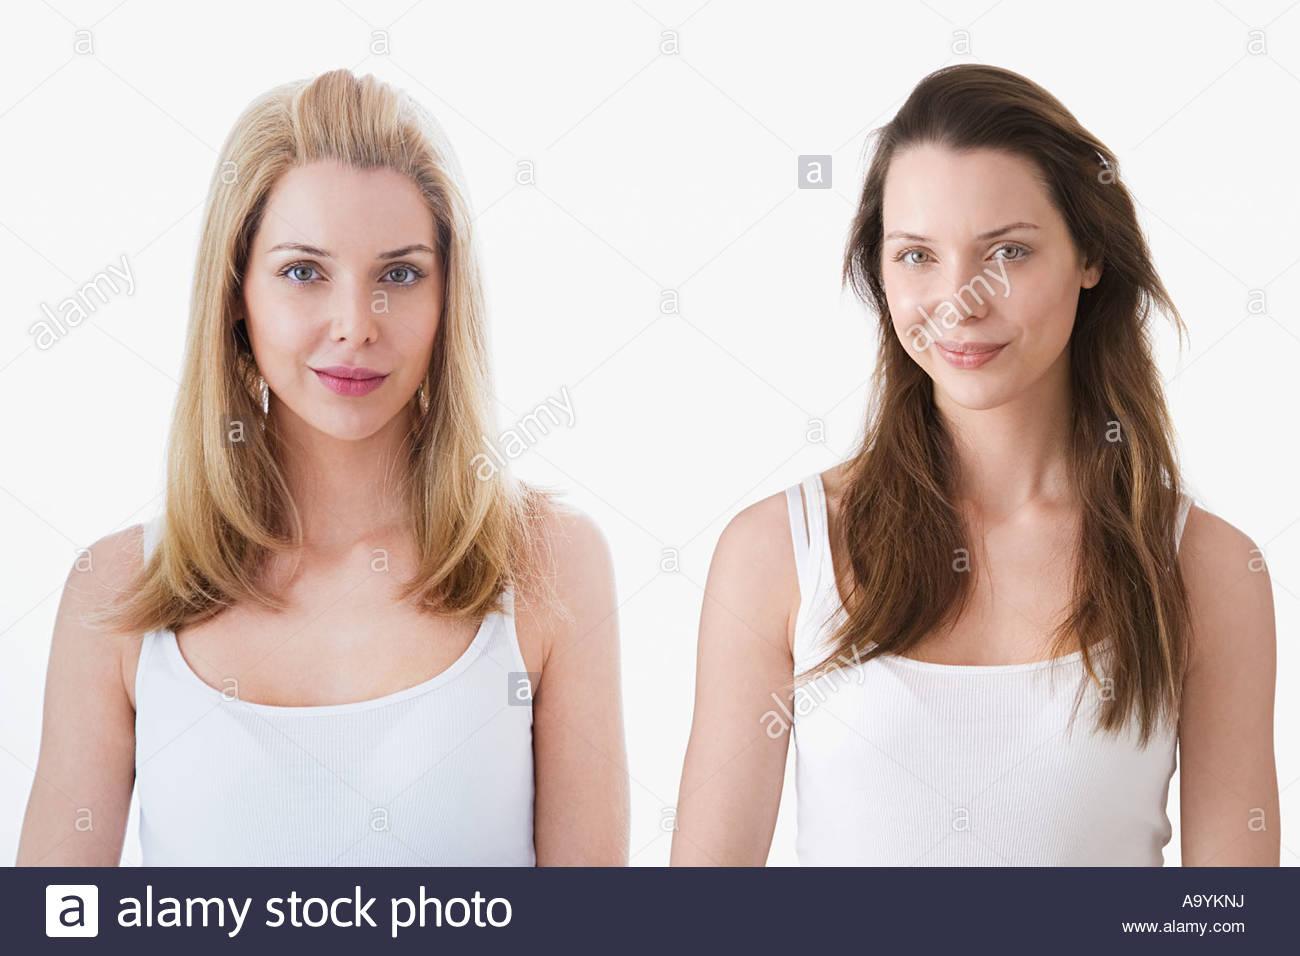 Dos mujeres parecidos Imagen De Stock